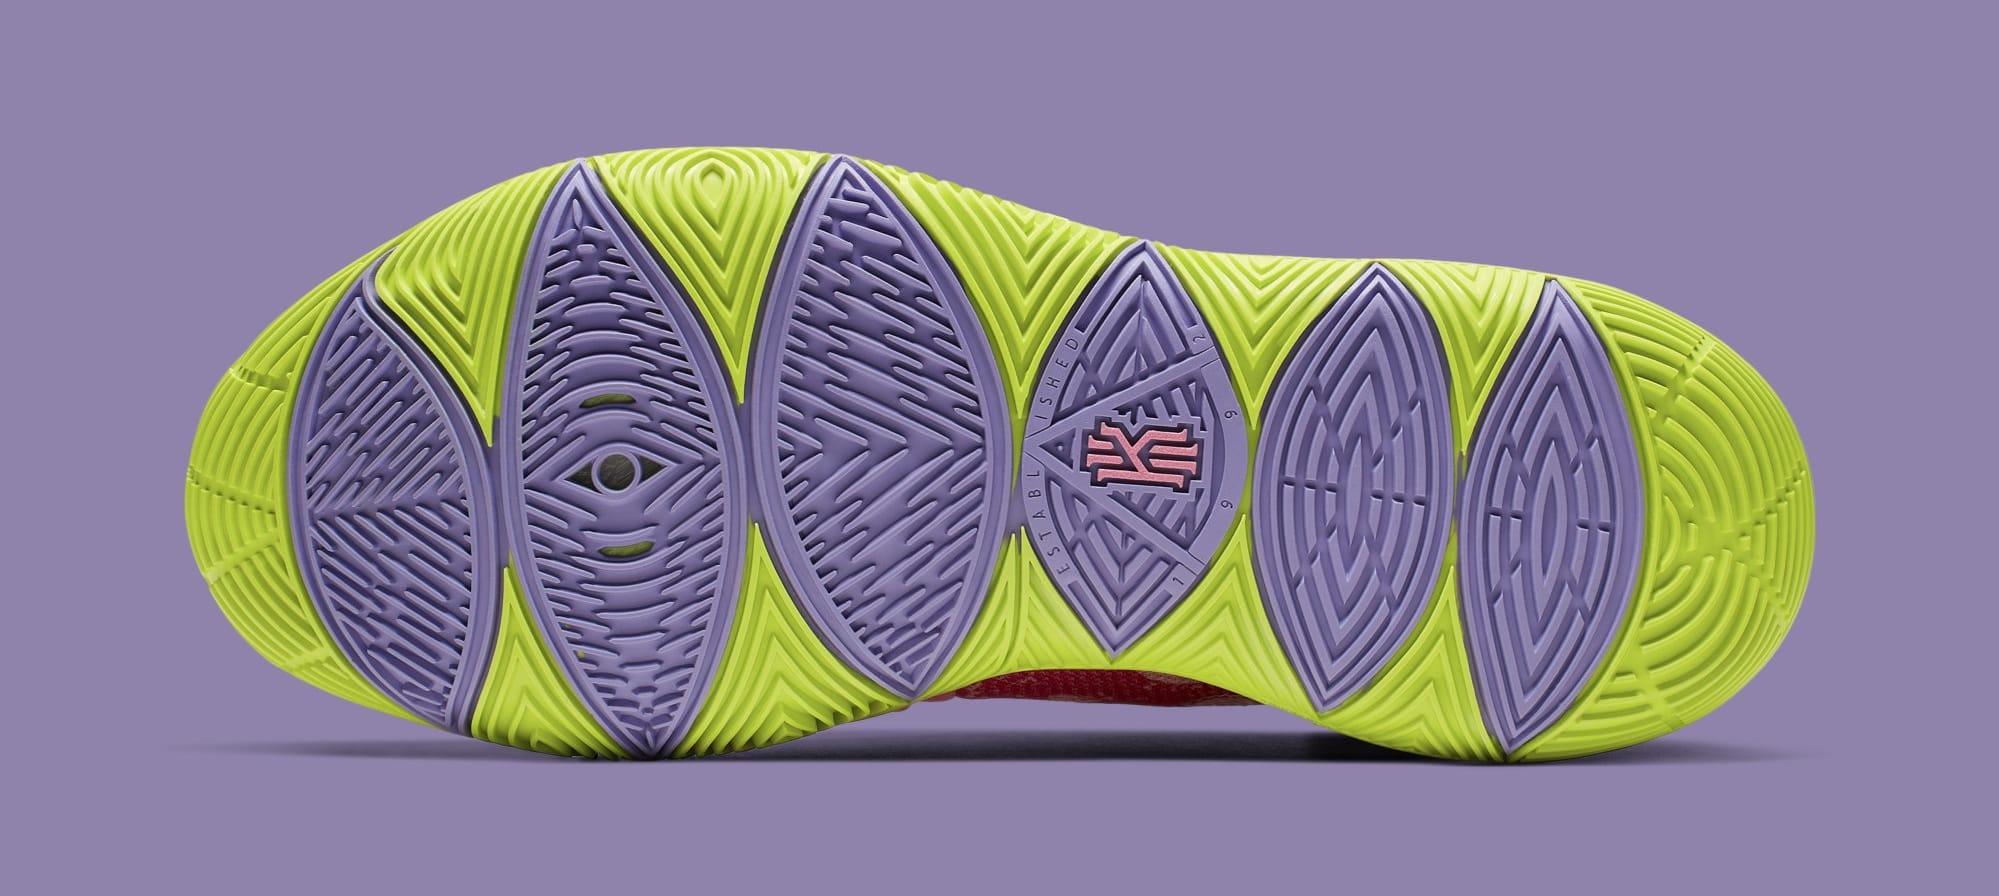 'SpongeBob SquarePants' x Nike Kyrie 5 'Patrick Star' CJ6951-600 (Bottom)